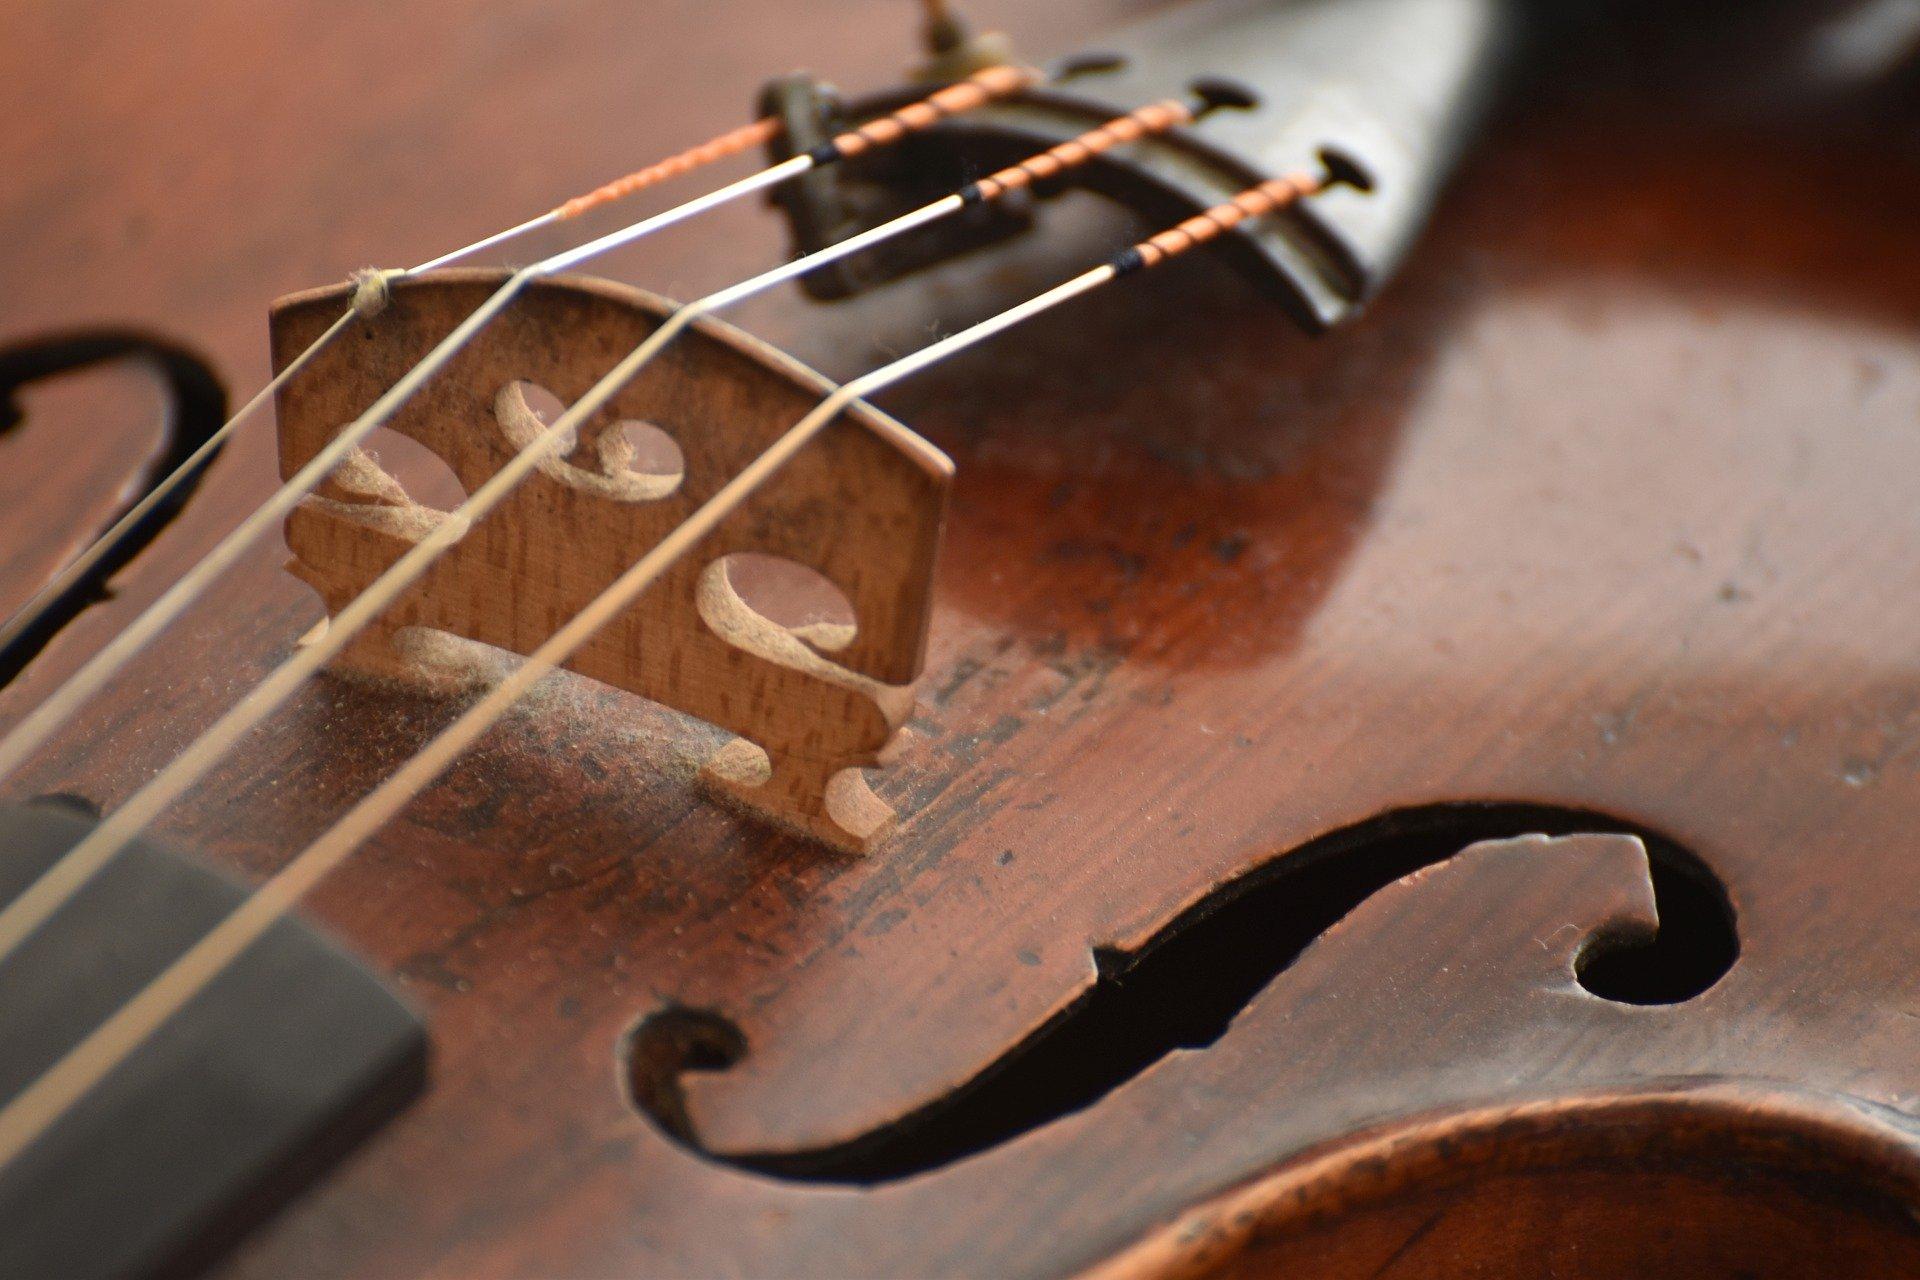 Violin 3886139 1920 Katermikesch Pixabay